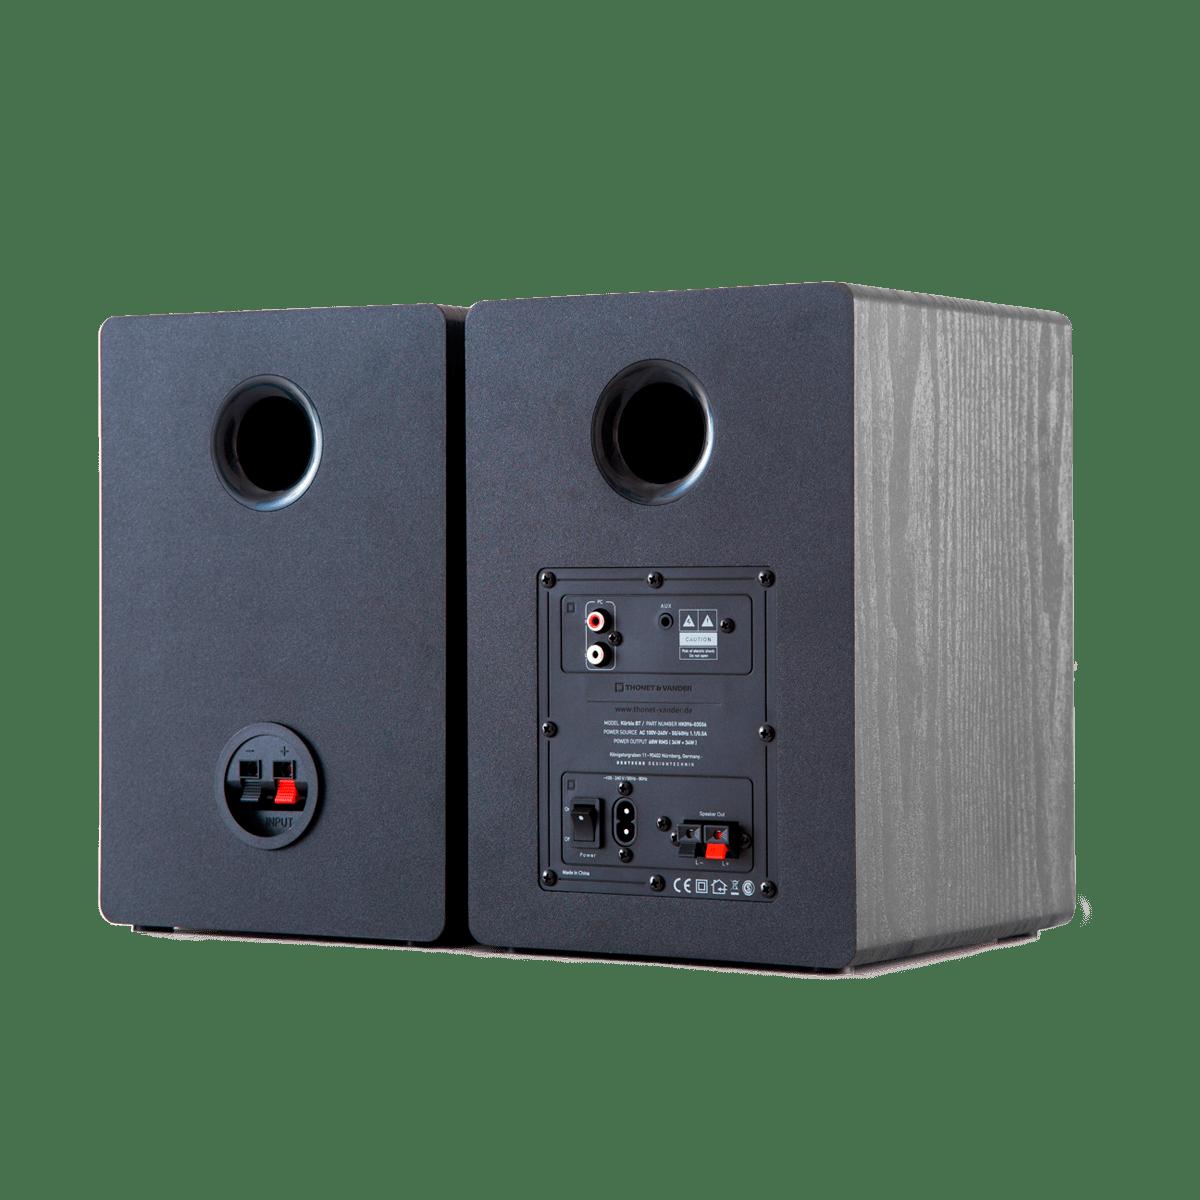 Thonet and Vander Kurbis BT Bluetooth Bookshelf Speakers 340 Peak Watts